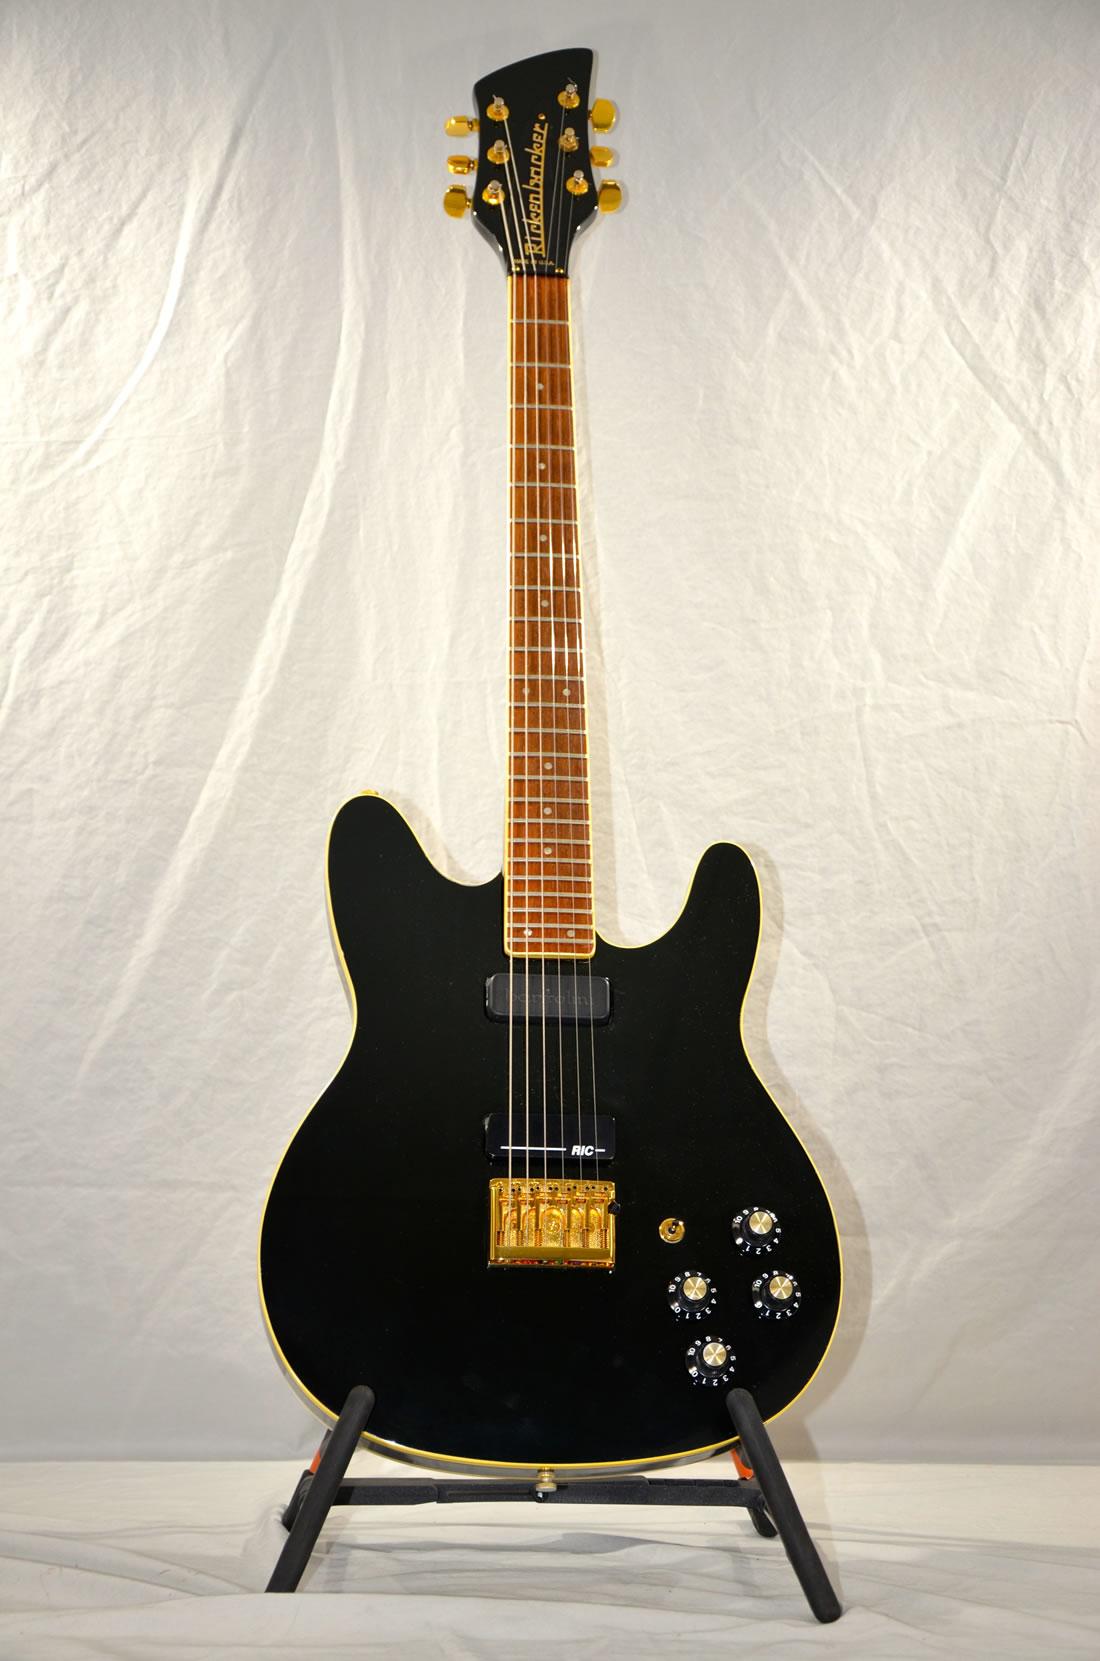 hight resolution of 1984 rickenbacker 250 eldorado 6 string vintage guitars and amps rickenbacker 360 wiring diagram sterio